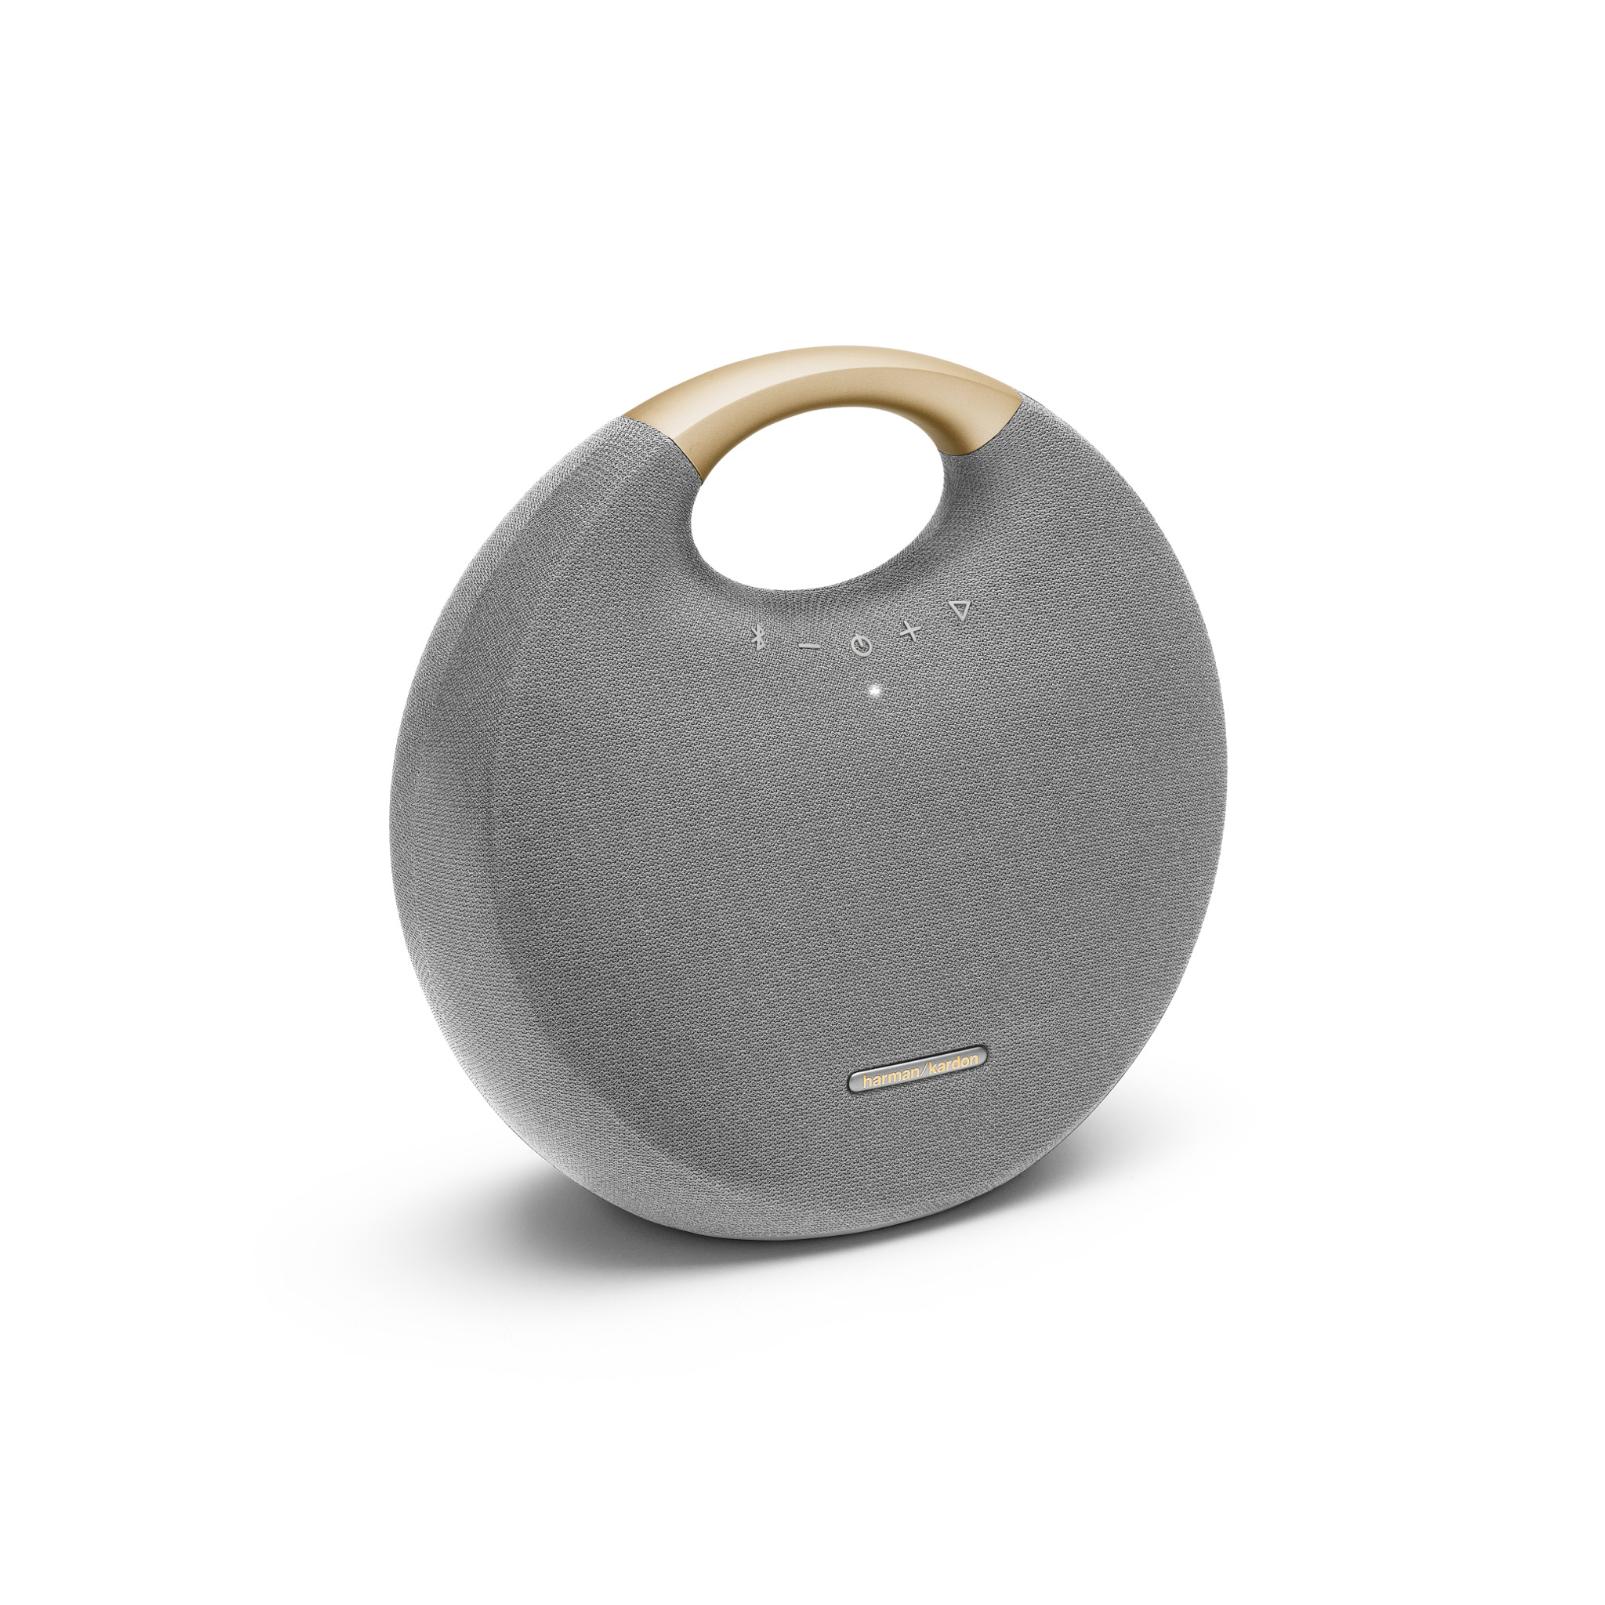 Onyx Studio 6 - Grey - Portable Bluetooth speaker - Detailshot 1